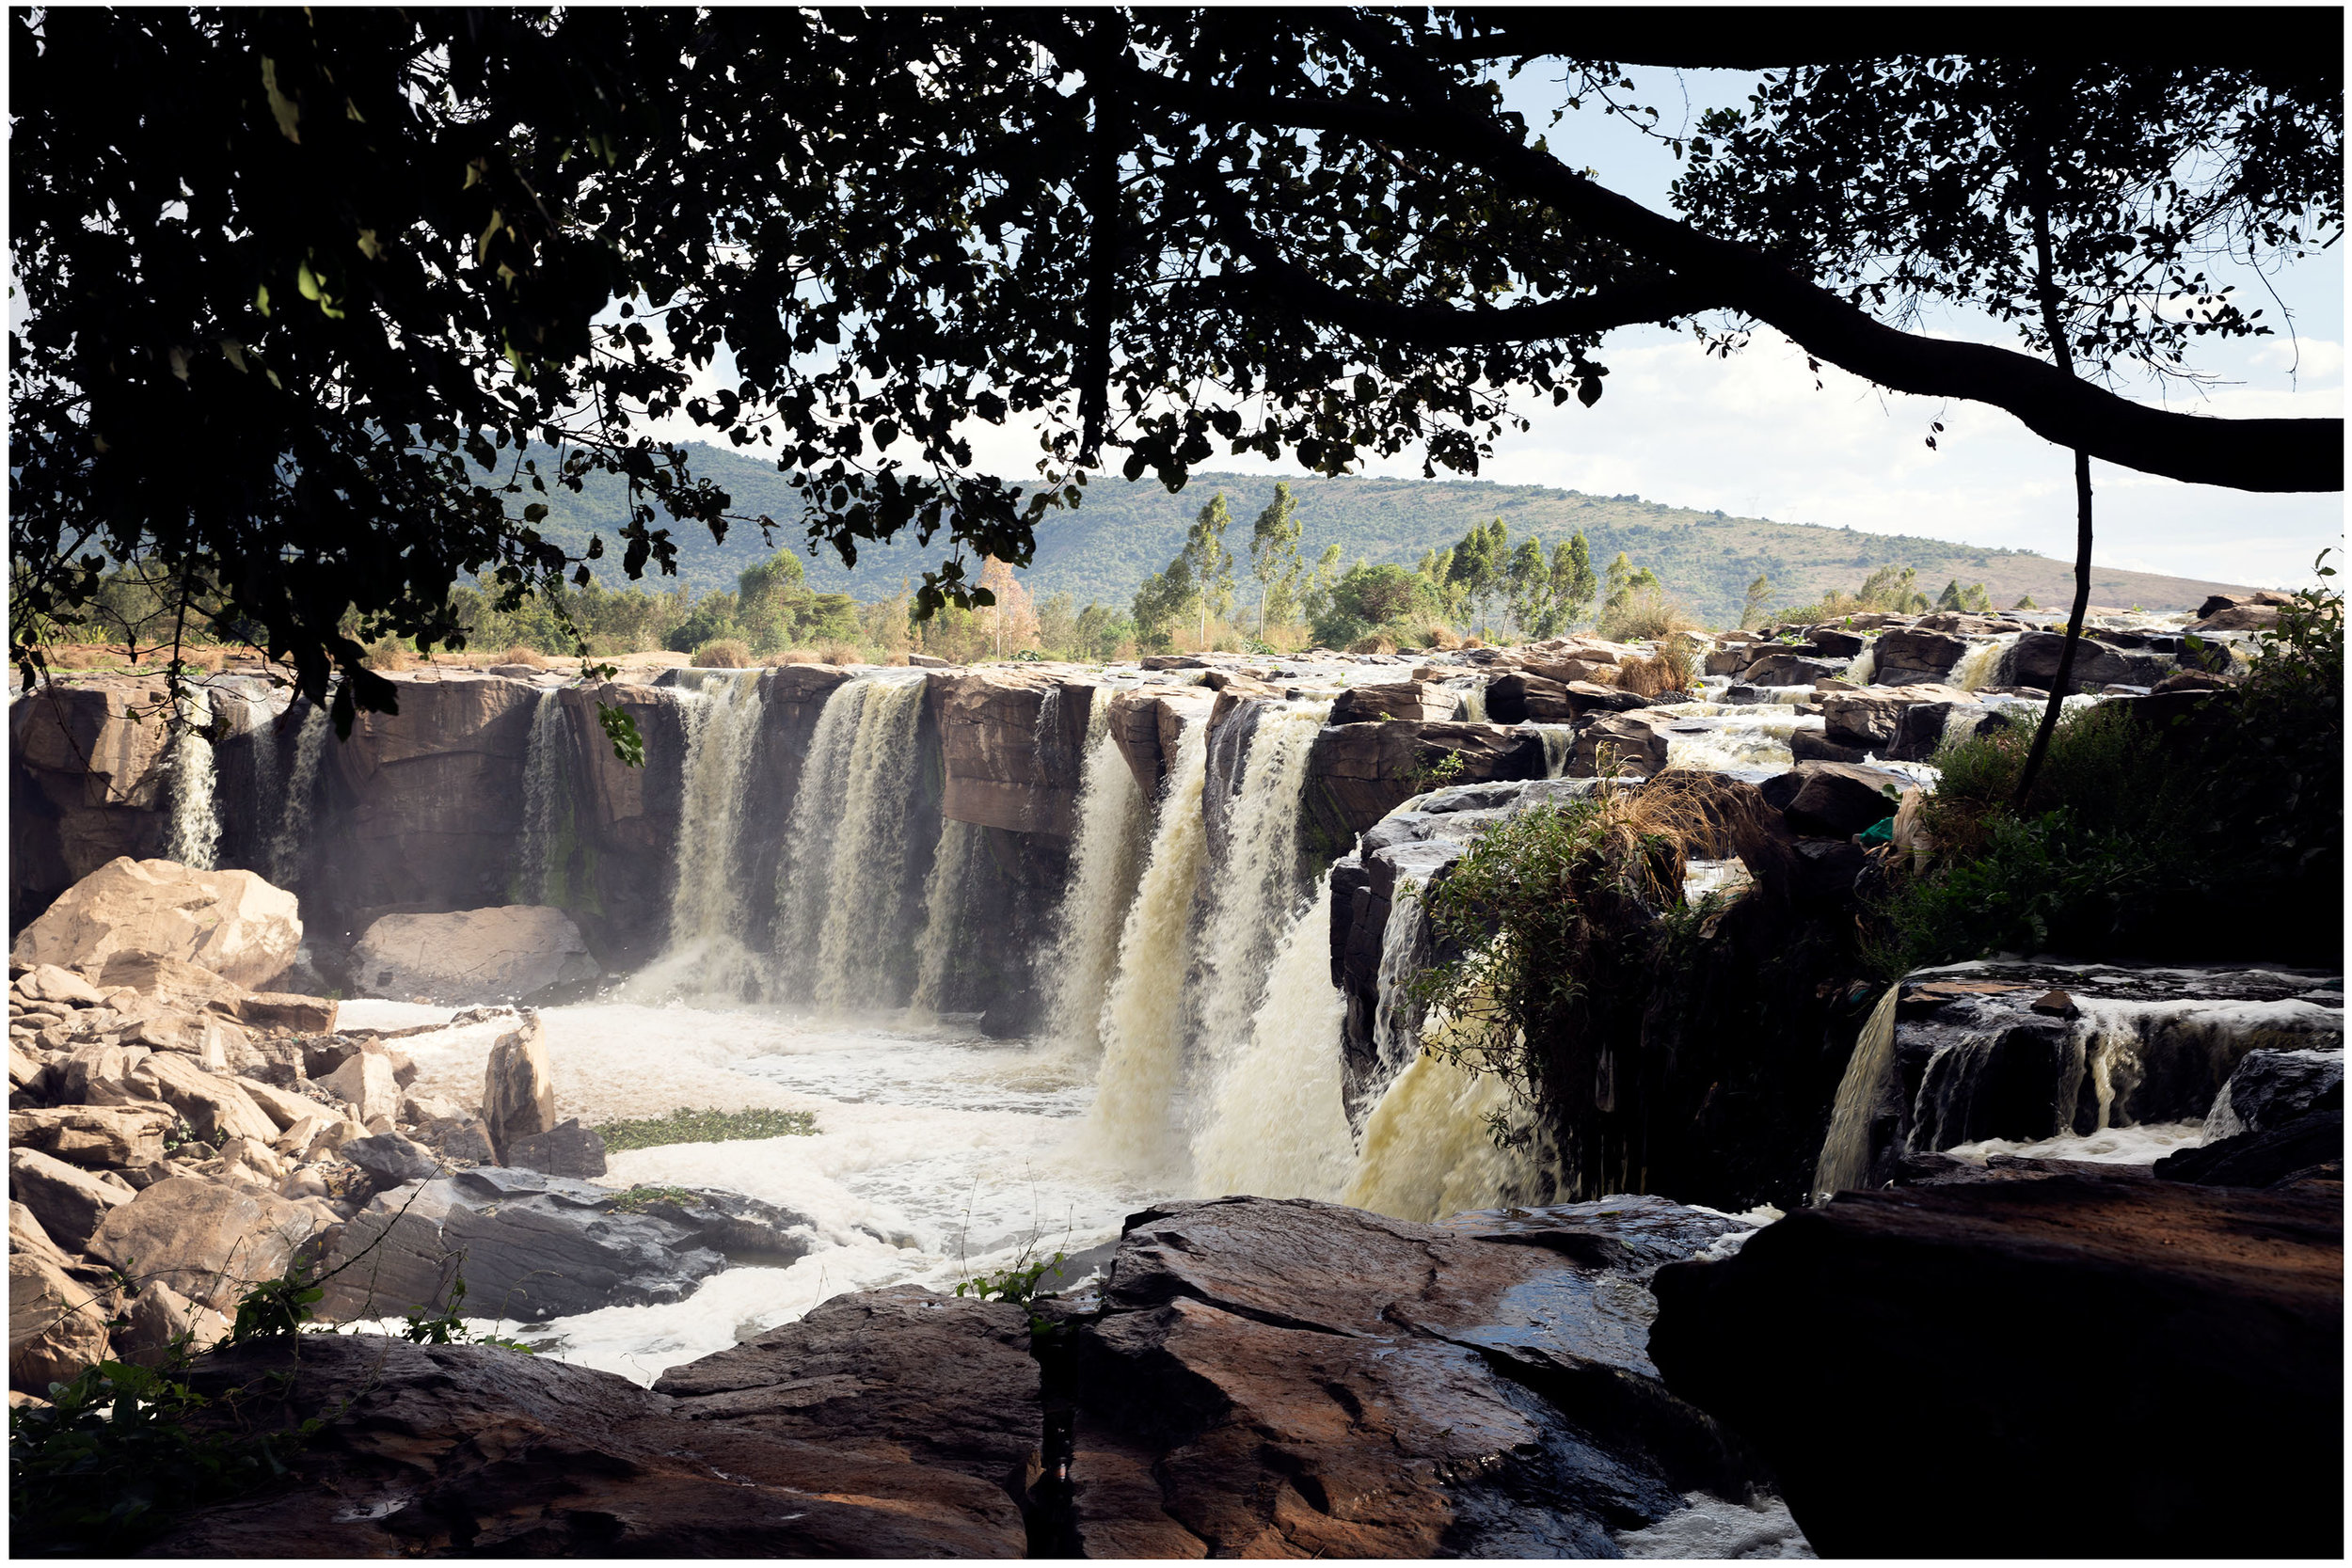 Fourteen Falls, Thika, Kenya. (View from Kiambu County)